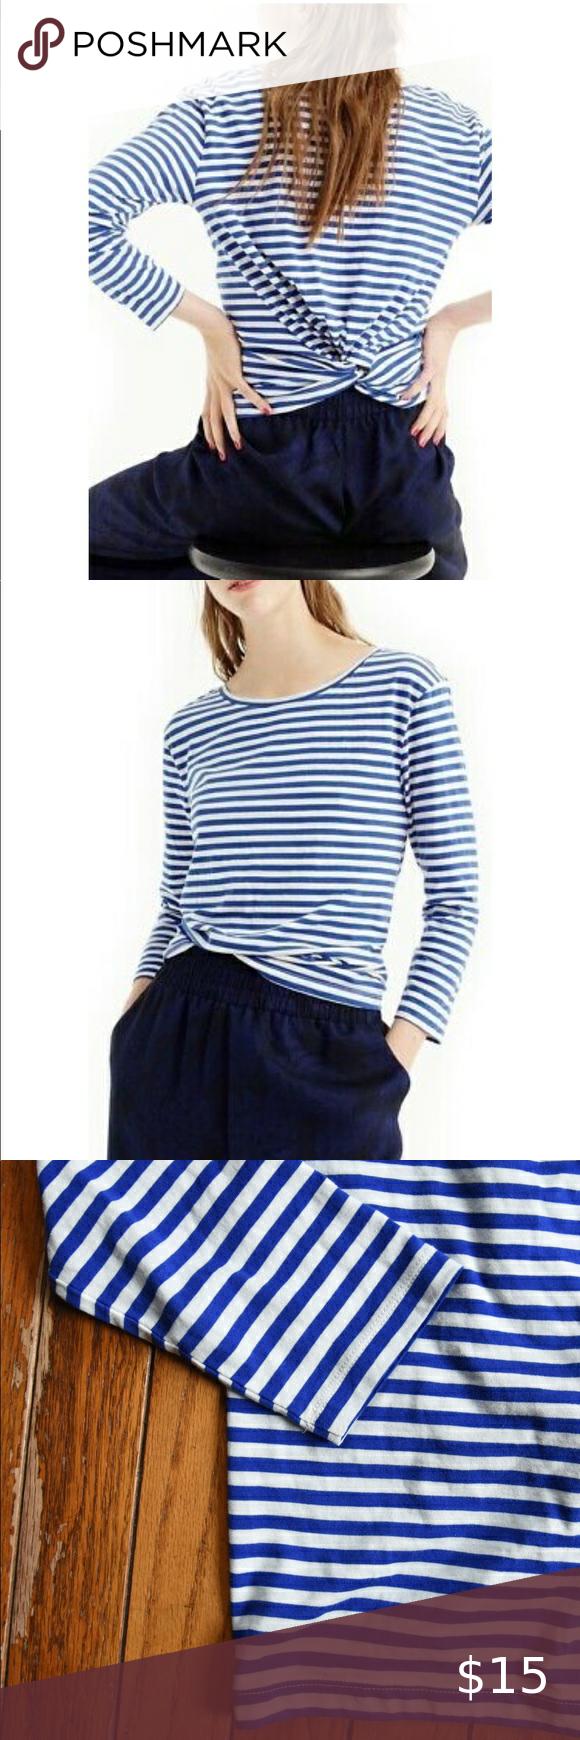 J Crew Black Label Clothes Design White Stripes Top Striped Top